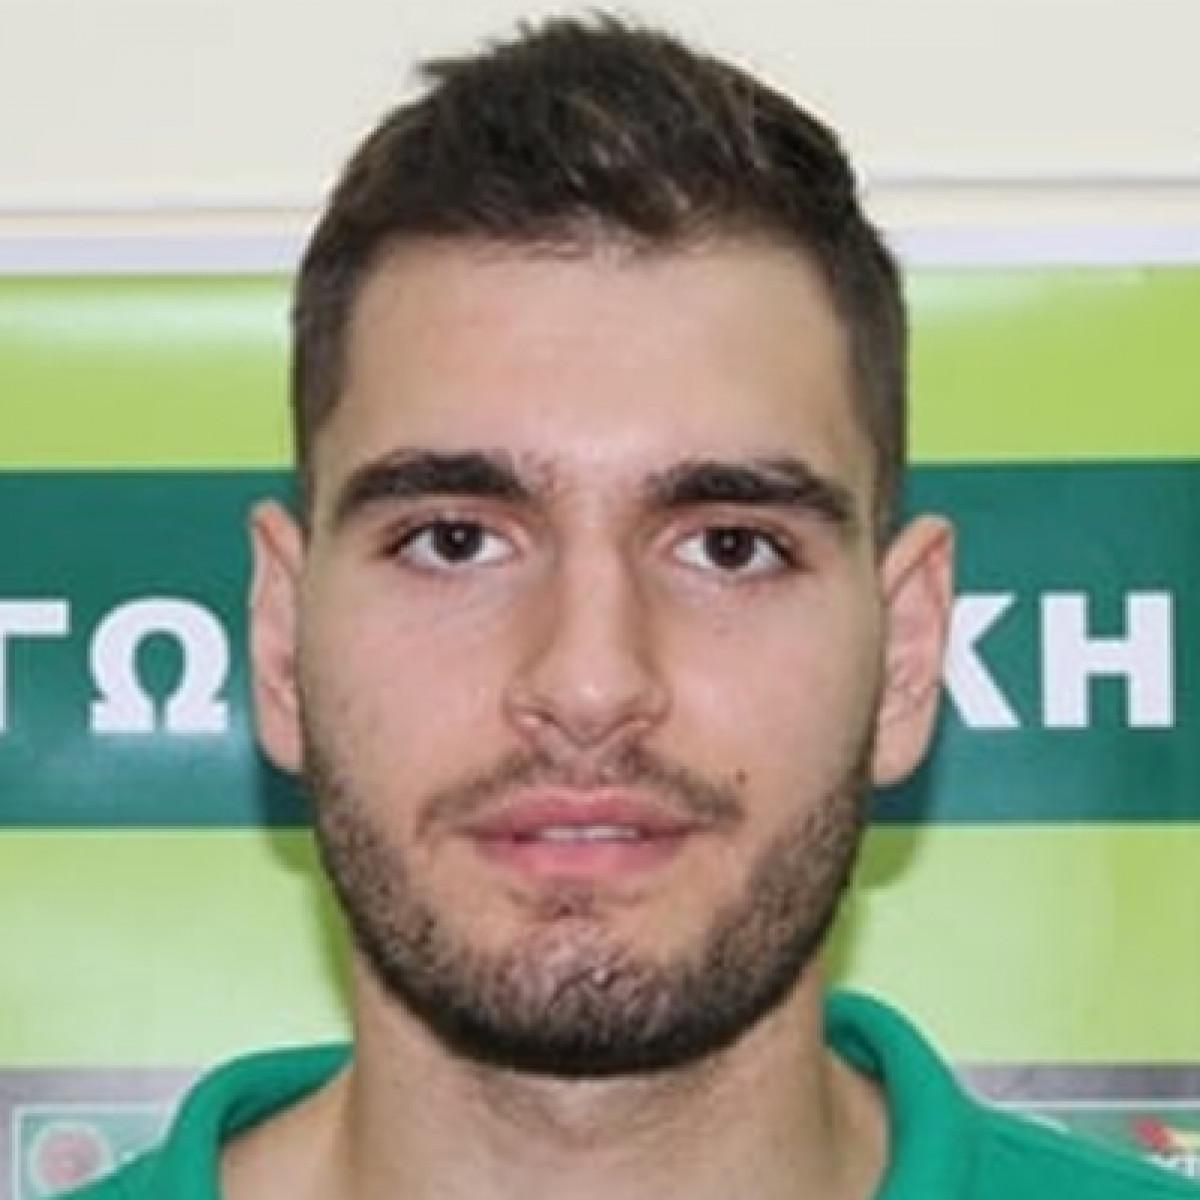 Alexandros Stamatogiannis